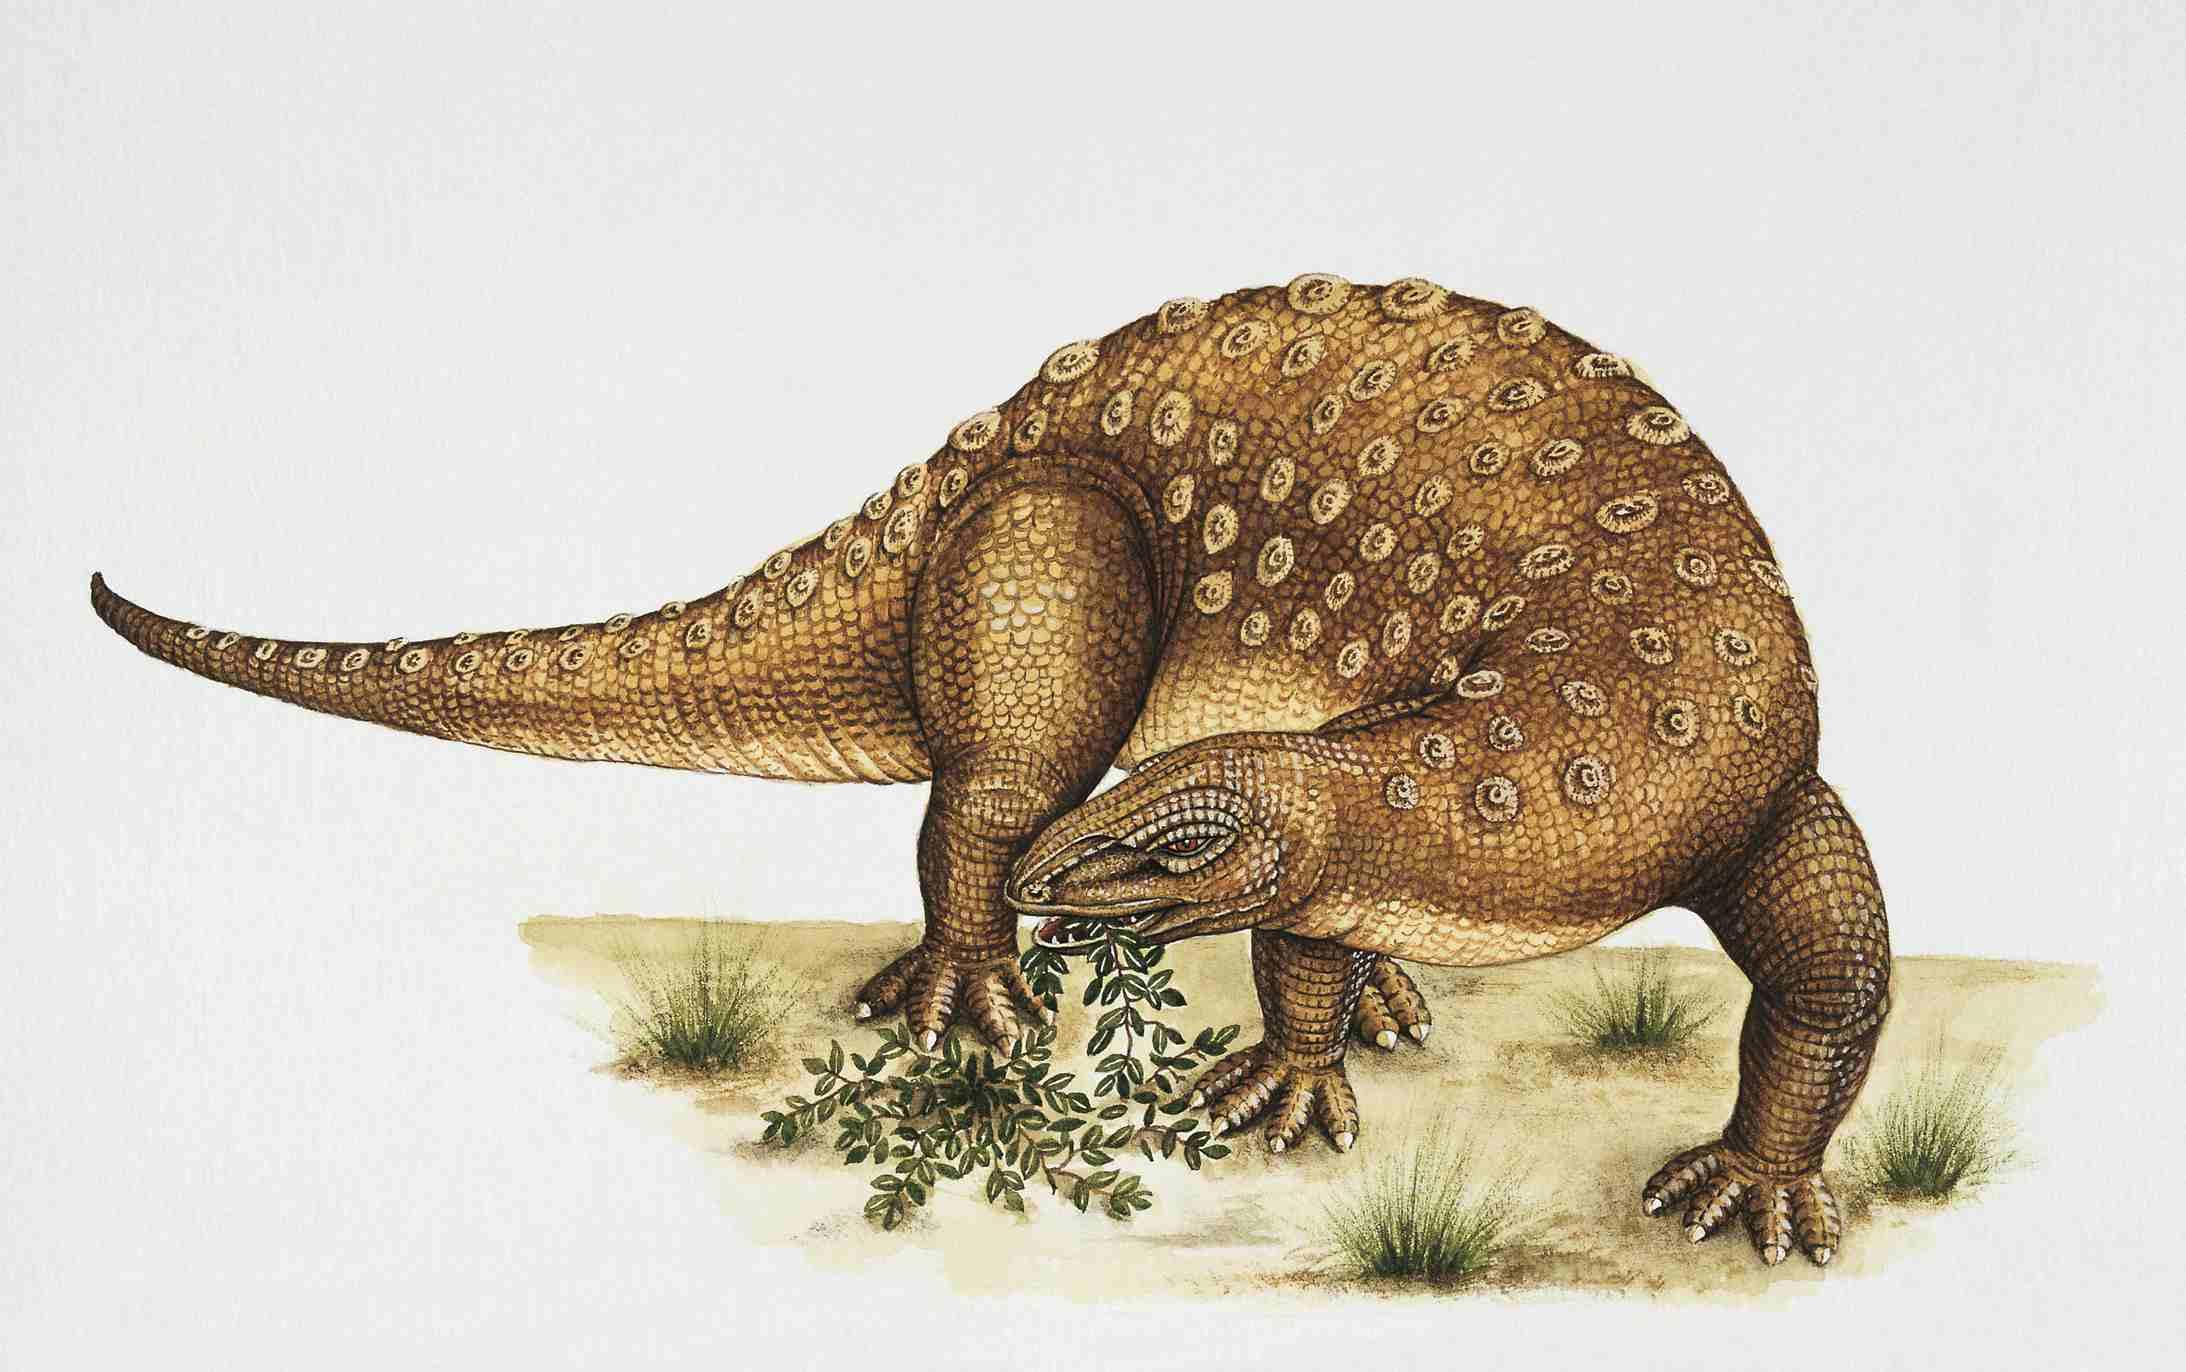 Minmi dinosaur eating grass